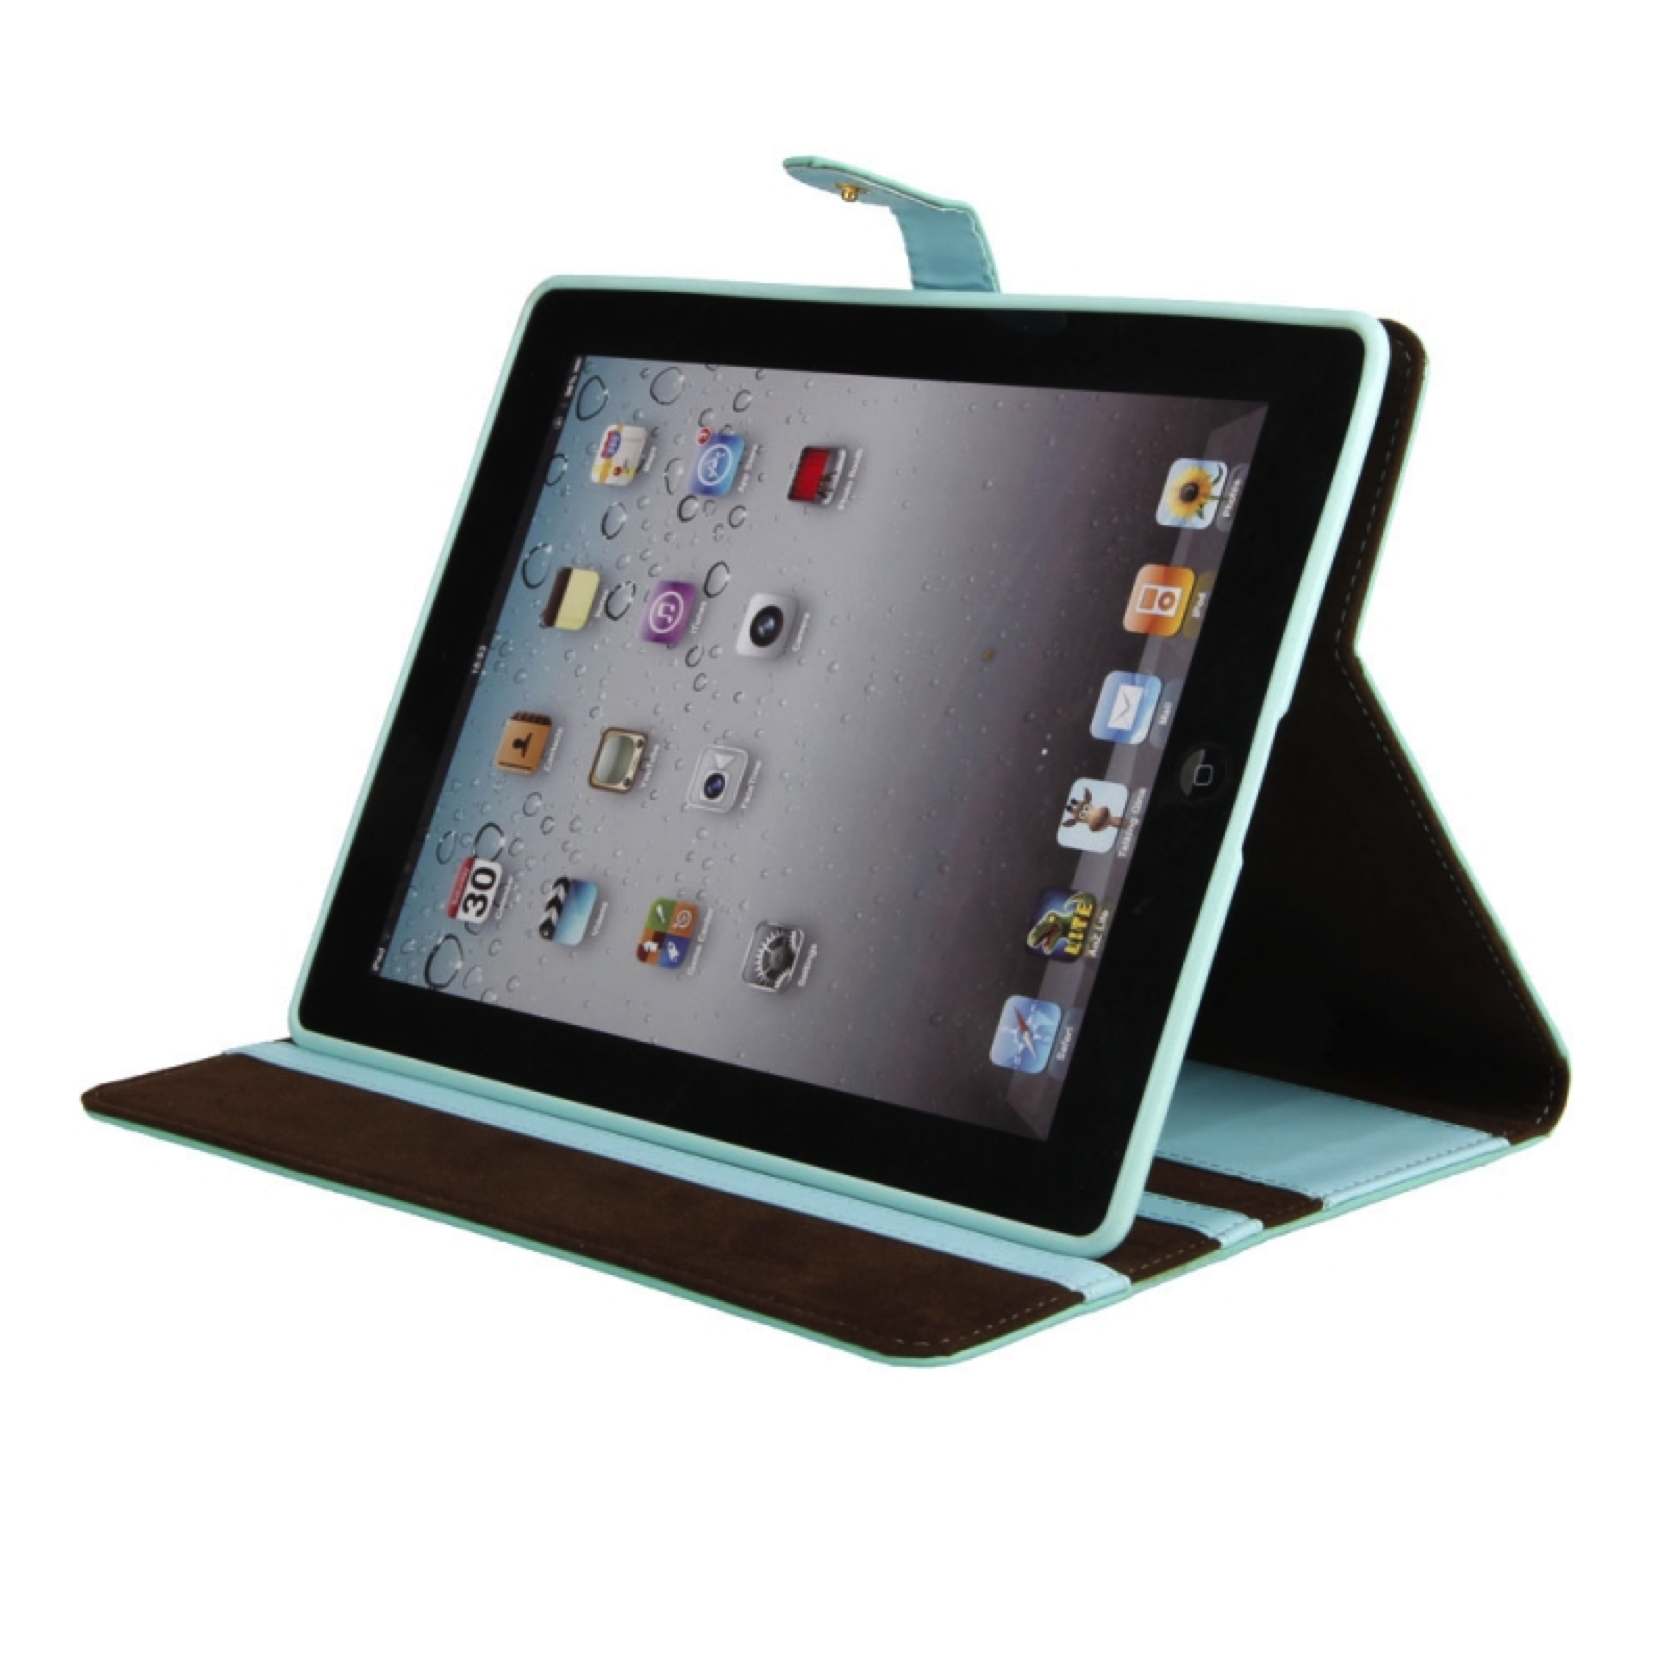 housse coque etui en cuir ipad 2 3 4 5 air ipad mini stylet ebay. Black Bedroom Furniture Sets. Home Design Ideas